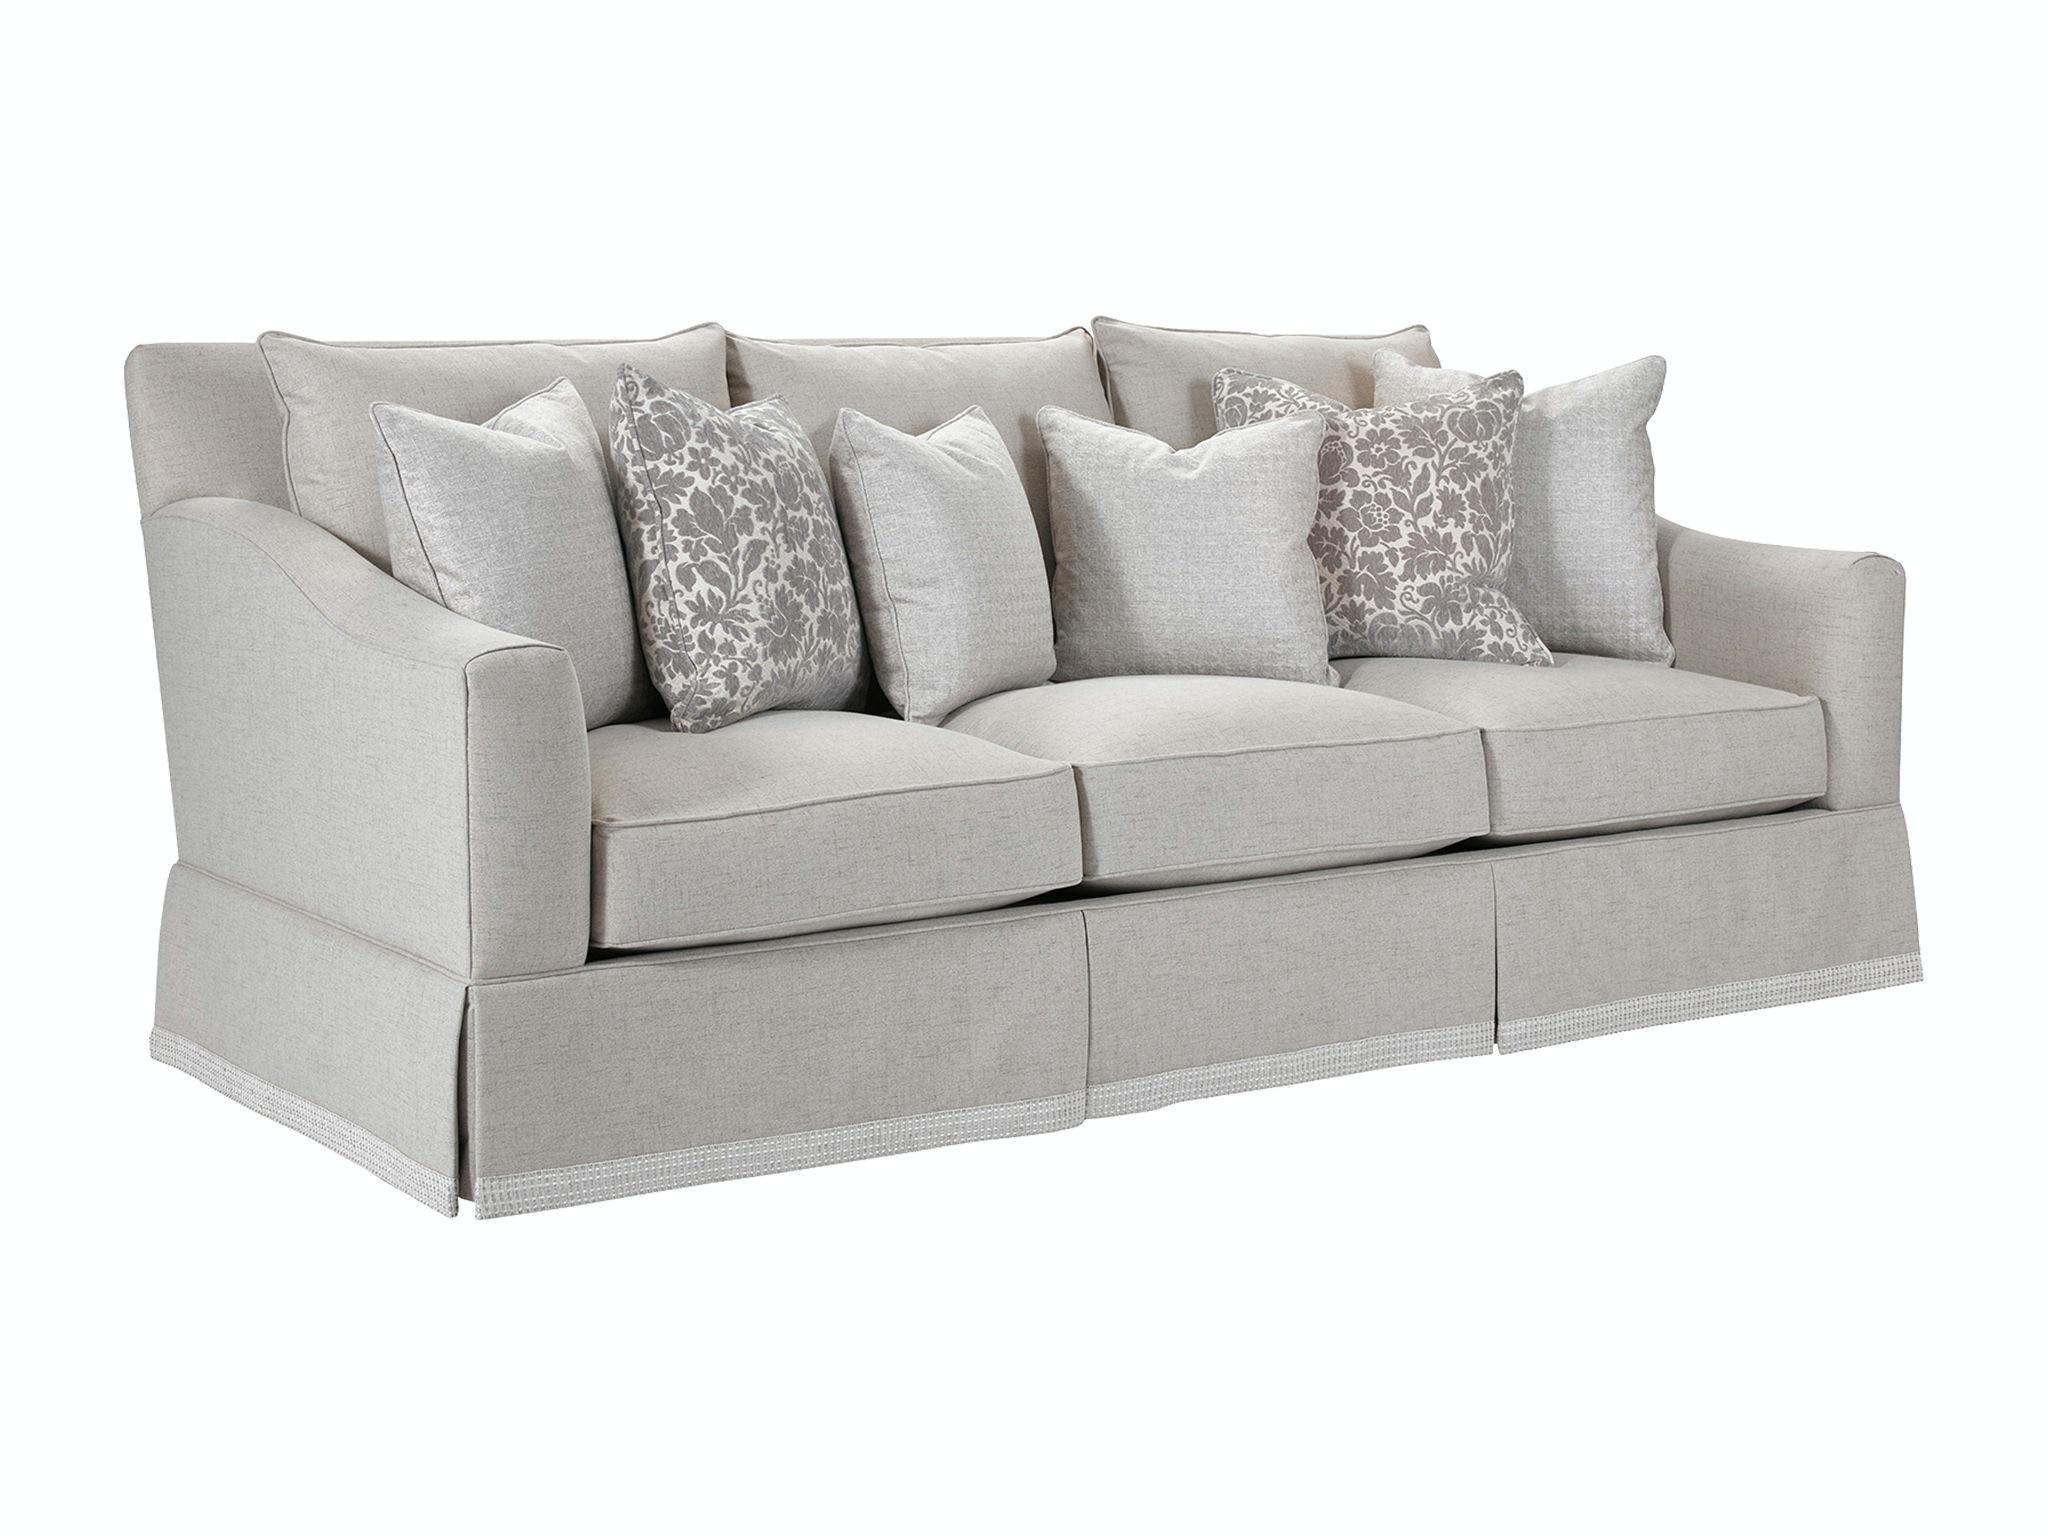 Merveilleux Broyhill Regina Sofa With Border Skirt 4284 3B